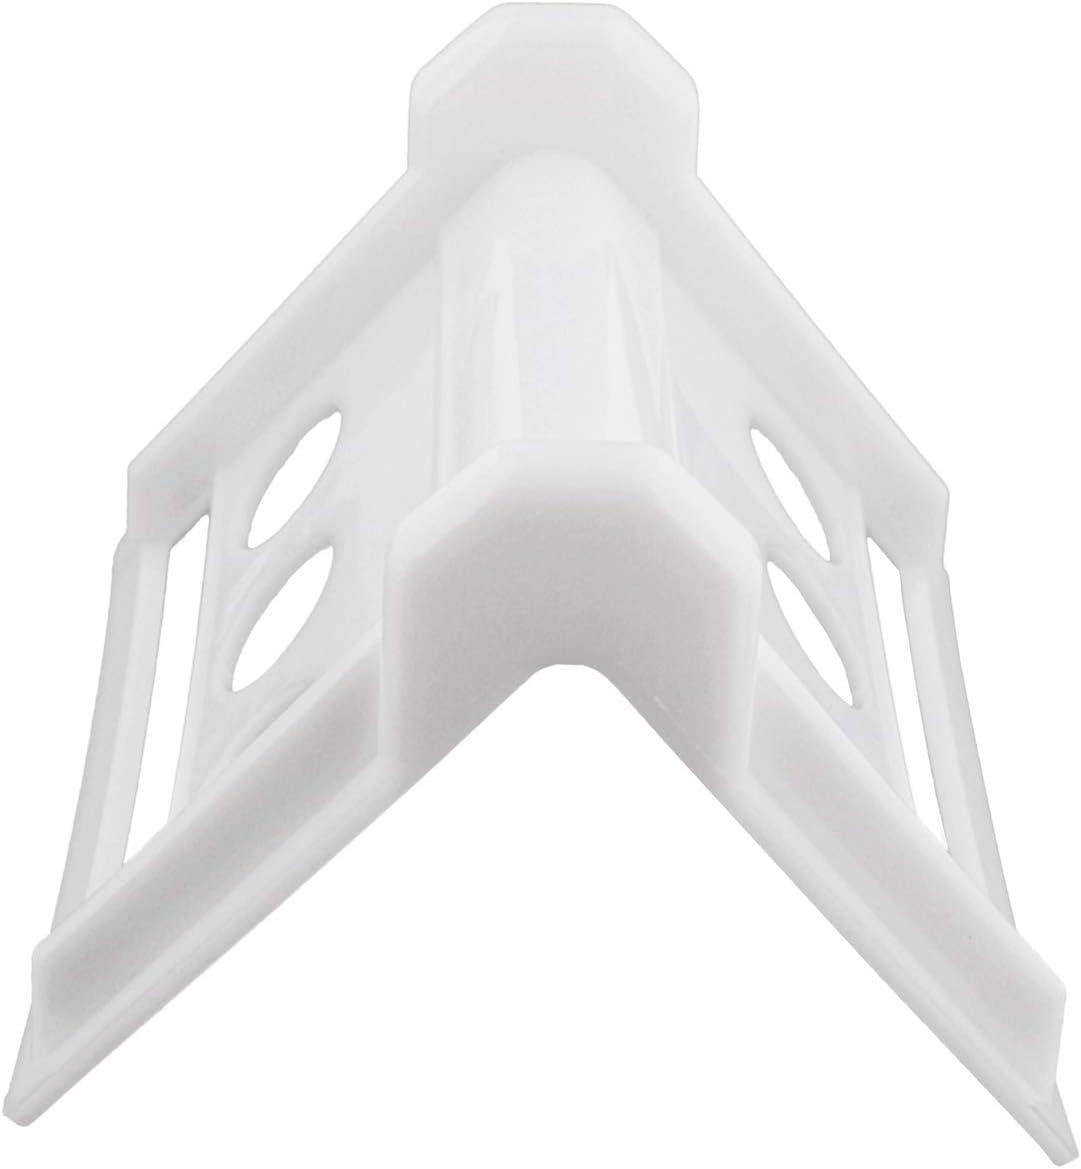 Corner Strap Protector Corner Protector Cargo Strap Protectors BISupply Cargo Edge Protectors White 10 Pack